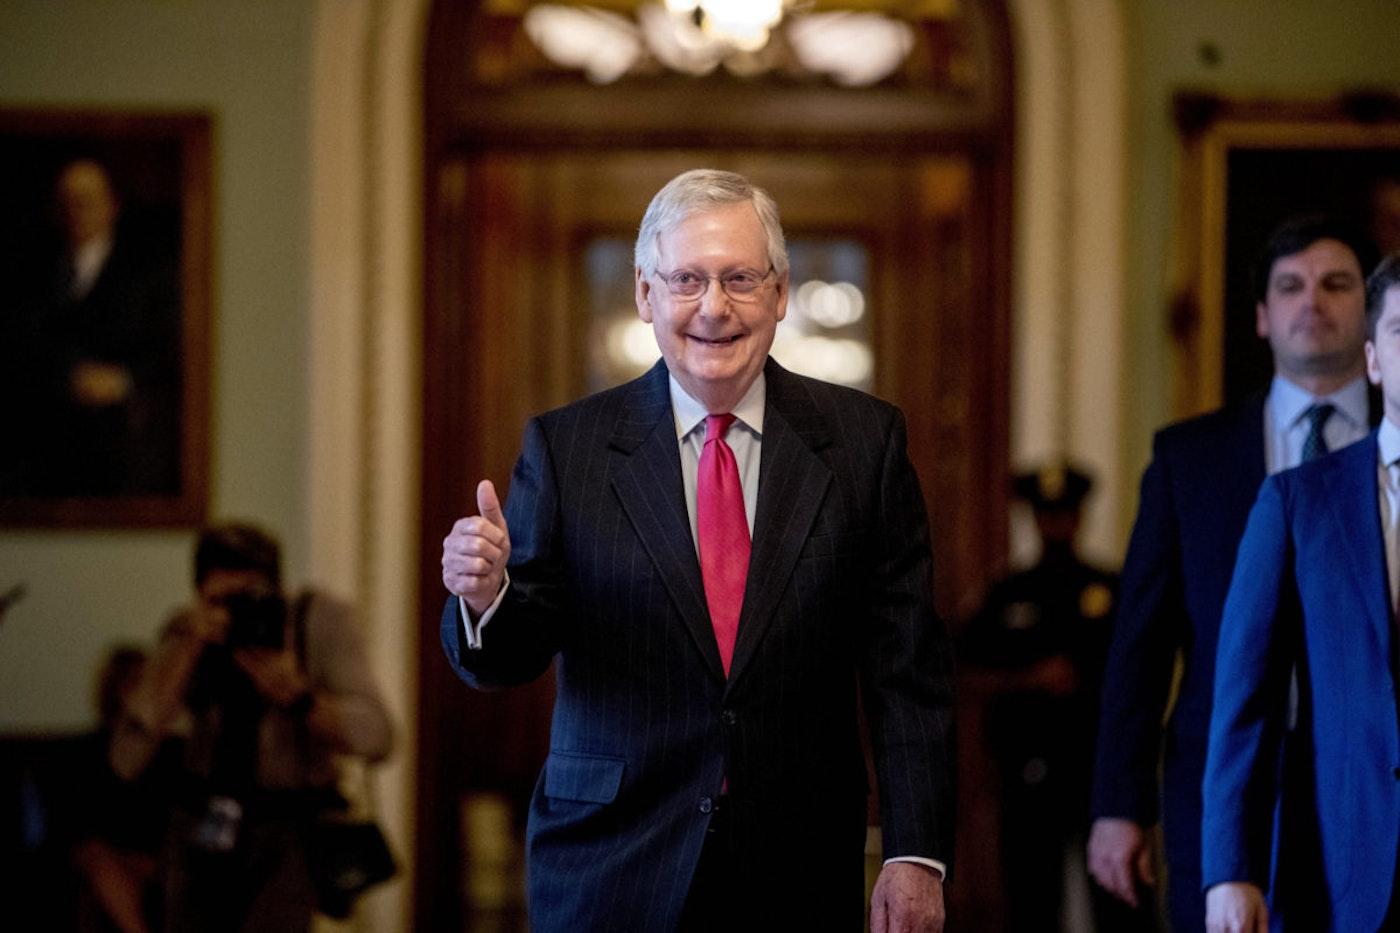 AP Photo/Andrew Harni